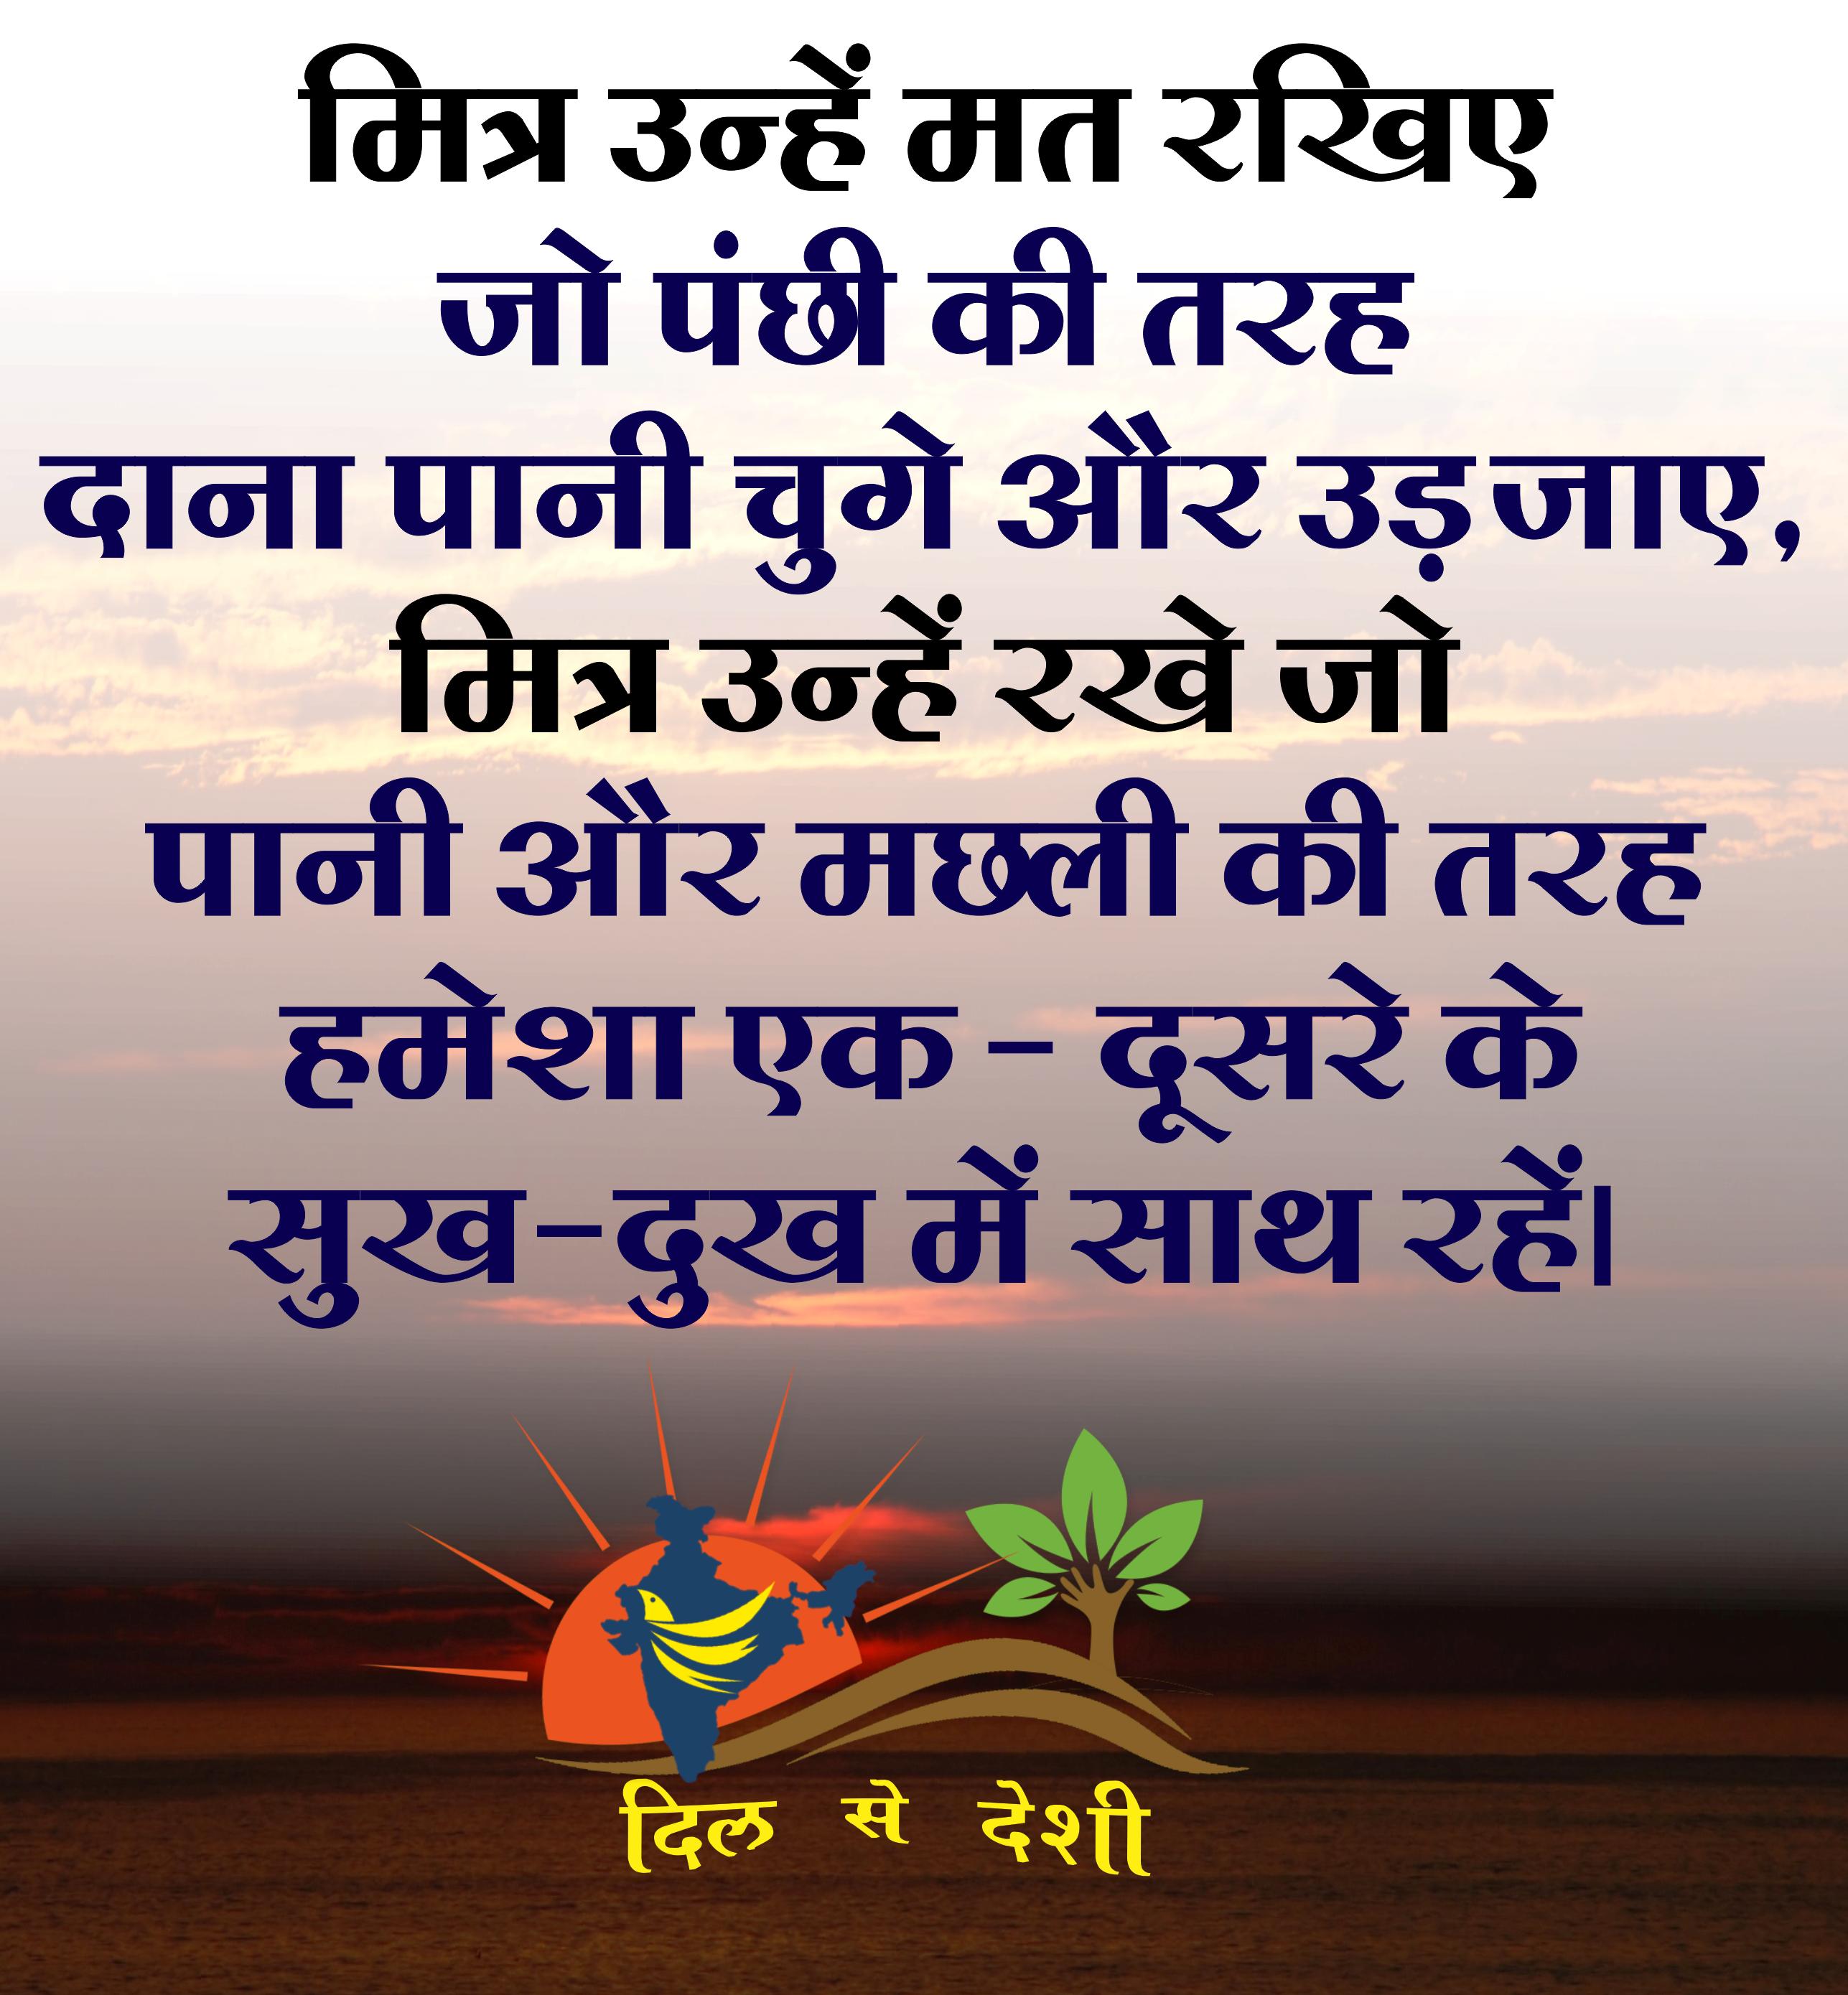 सुविचार | Good morning quotes, Hindi quotes, Cute love quotes